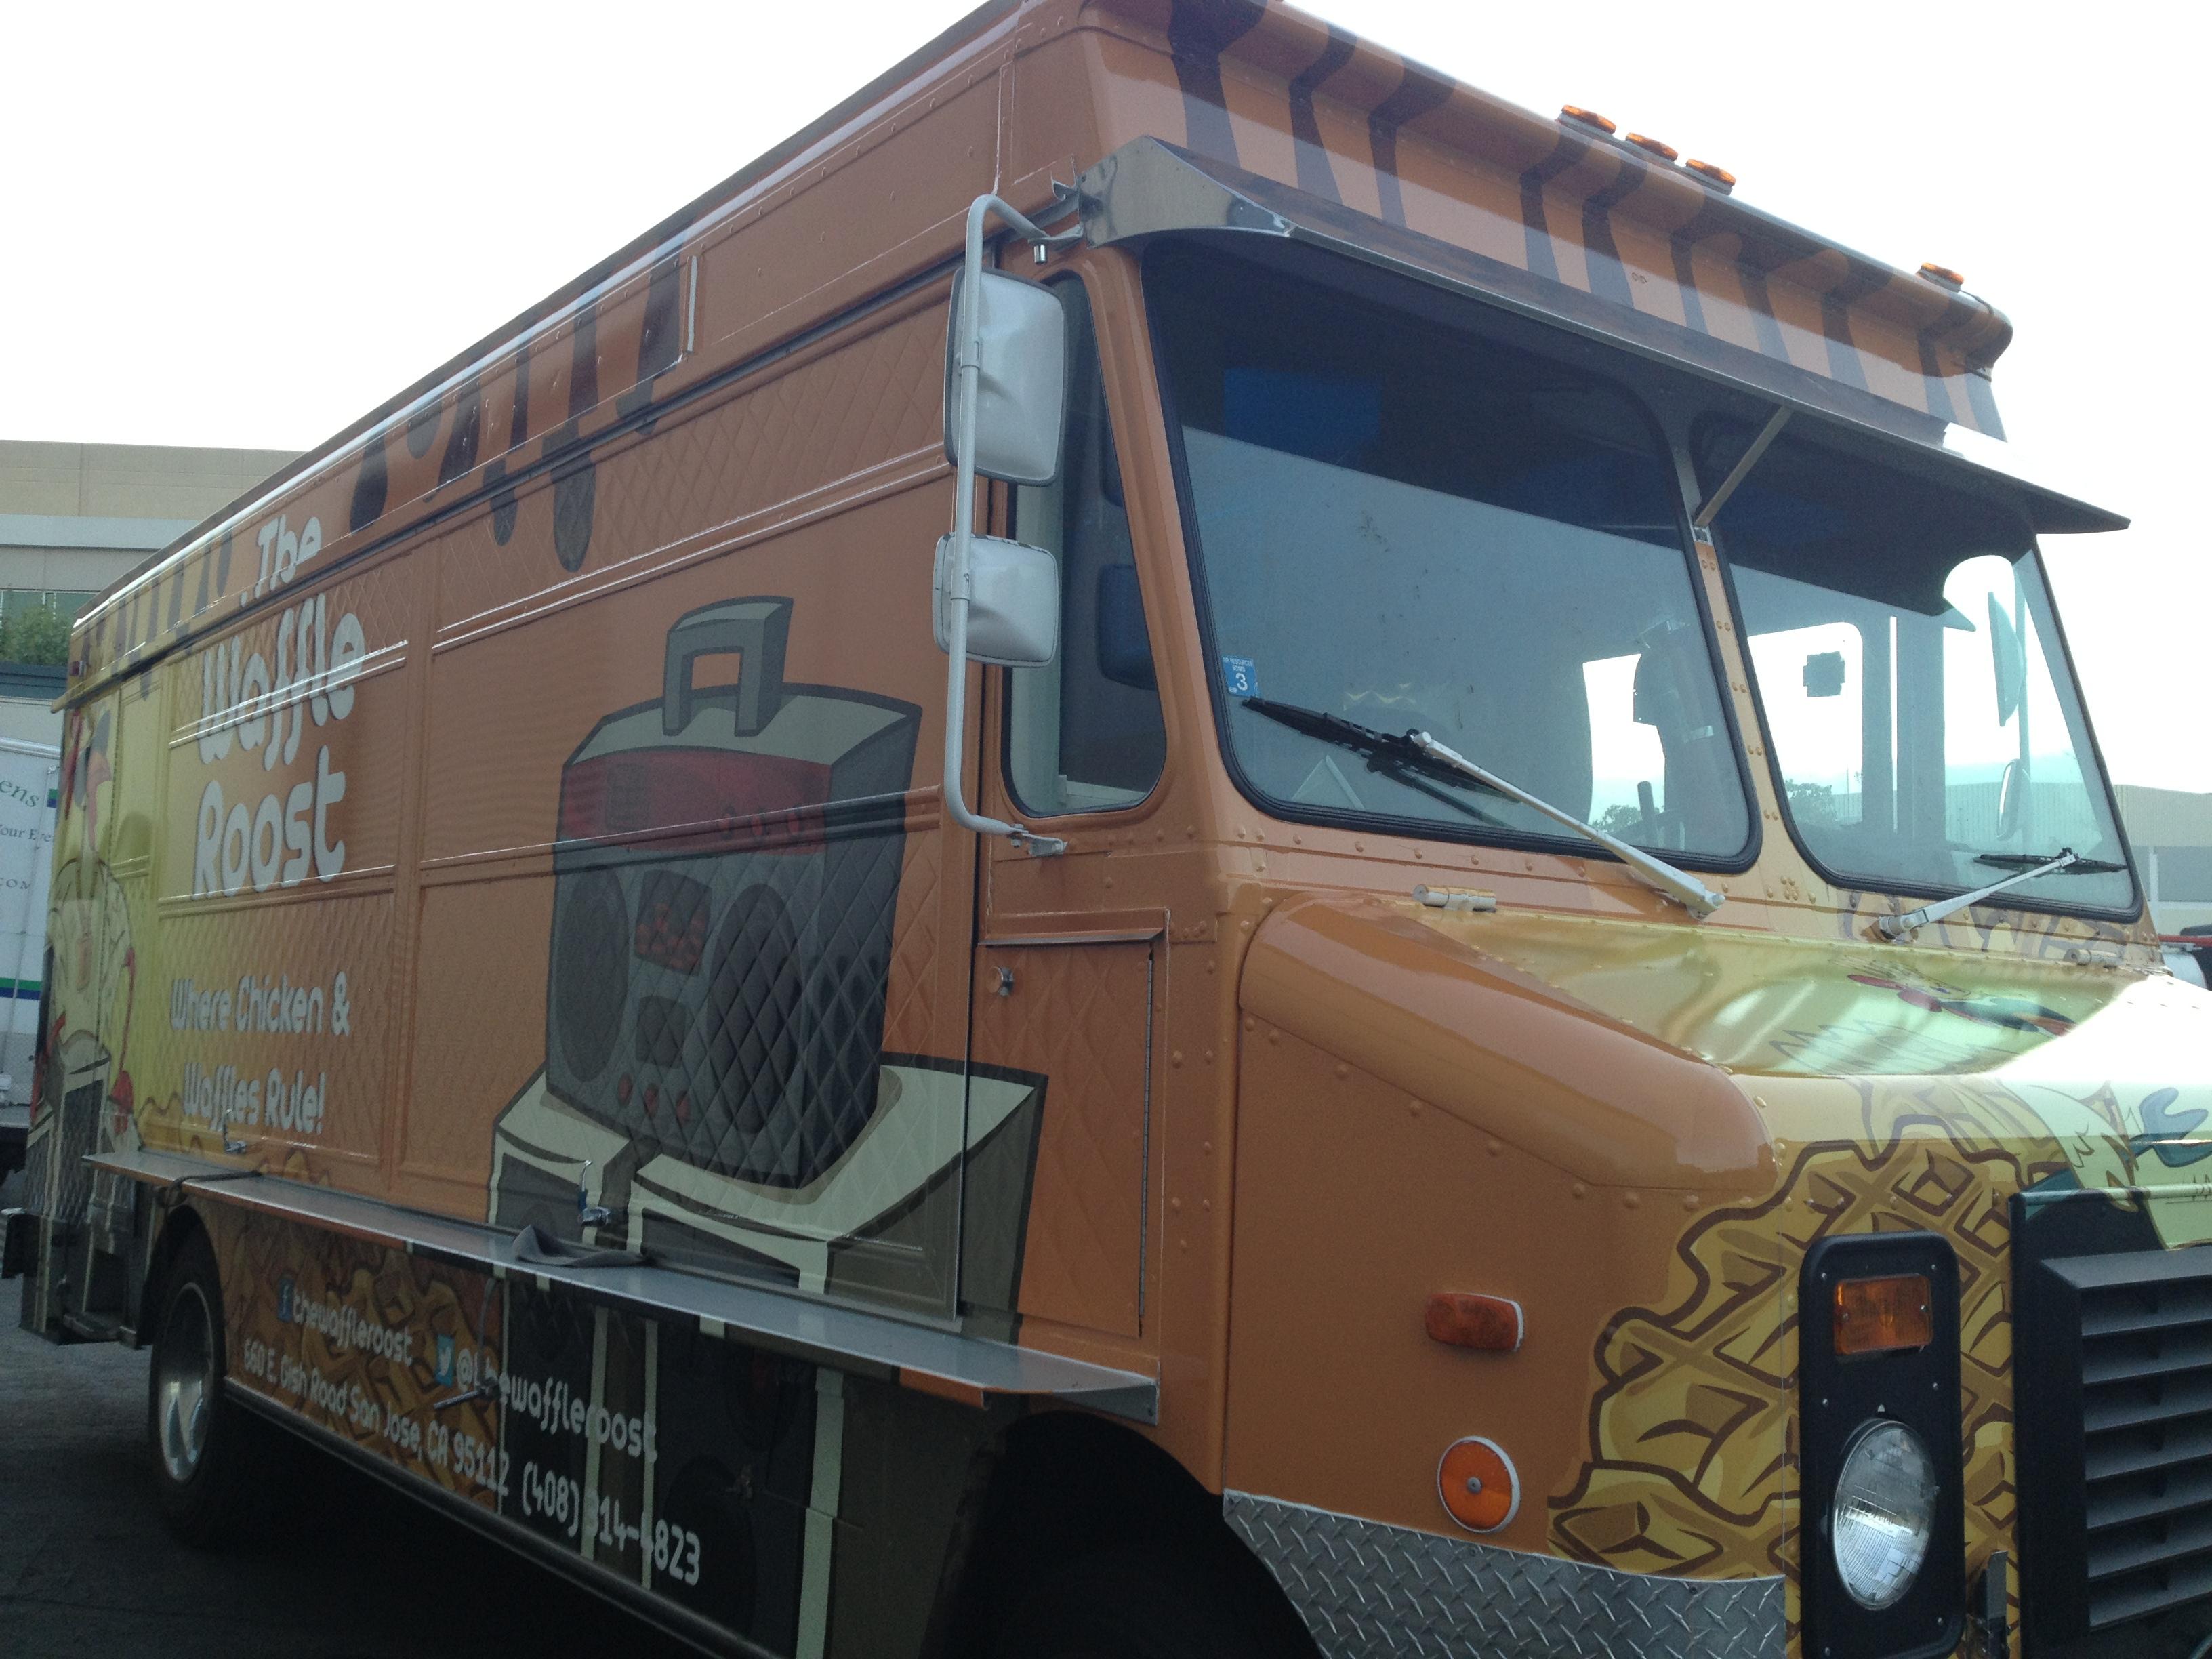 Waffle Roost Food Truck Menu